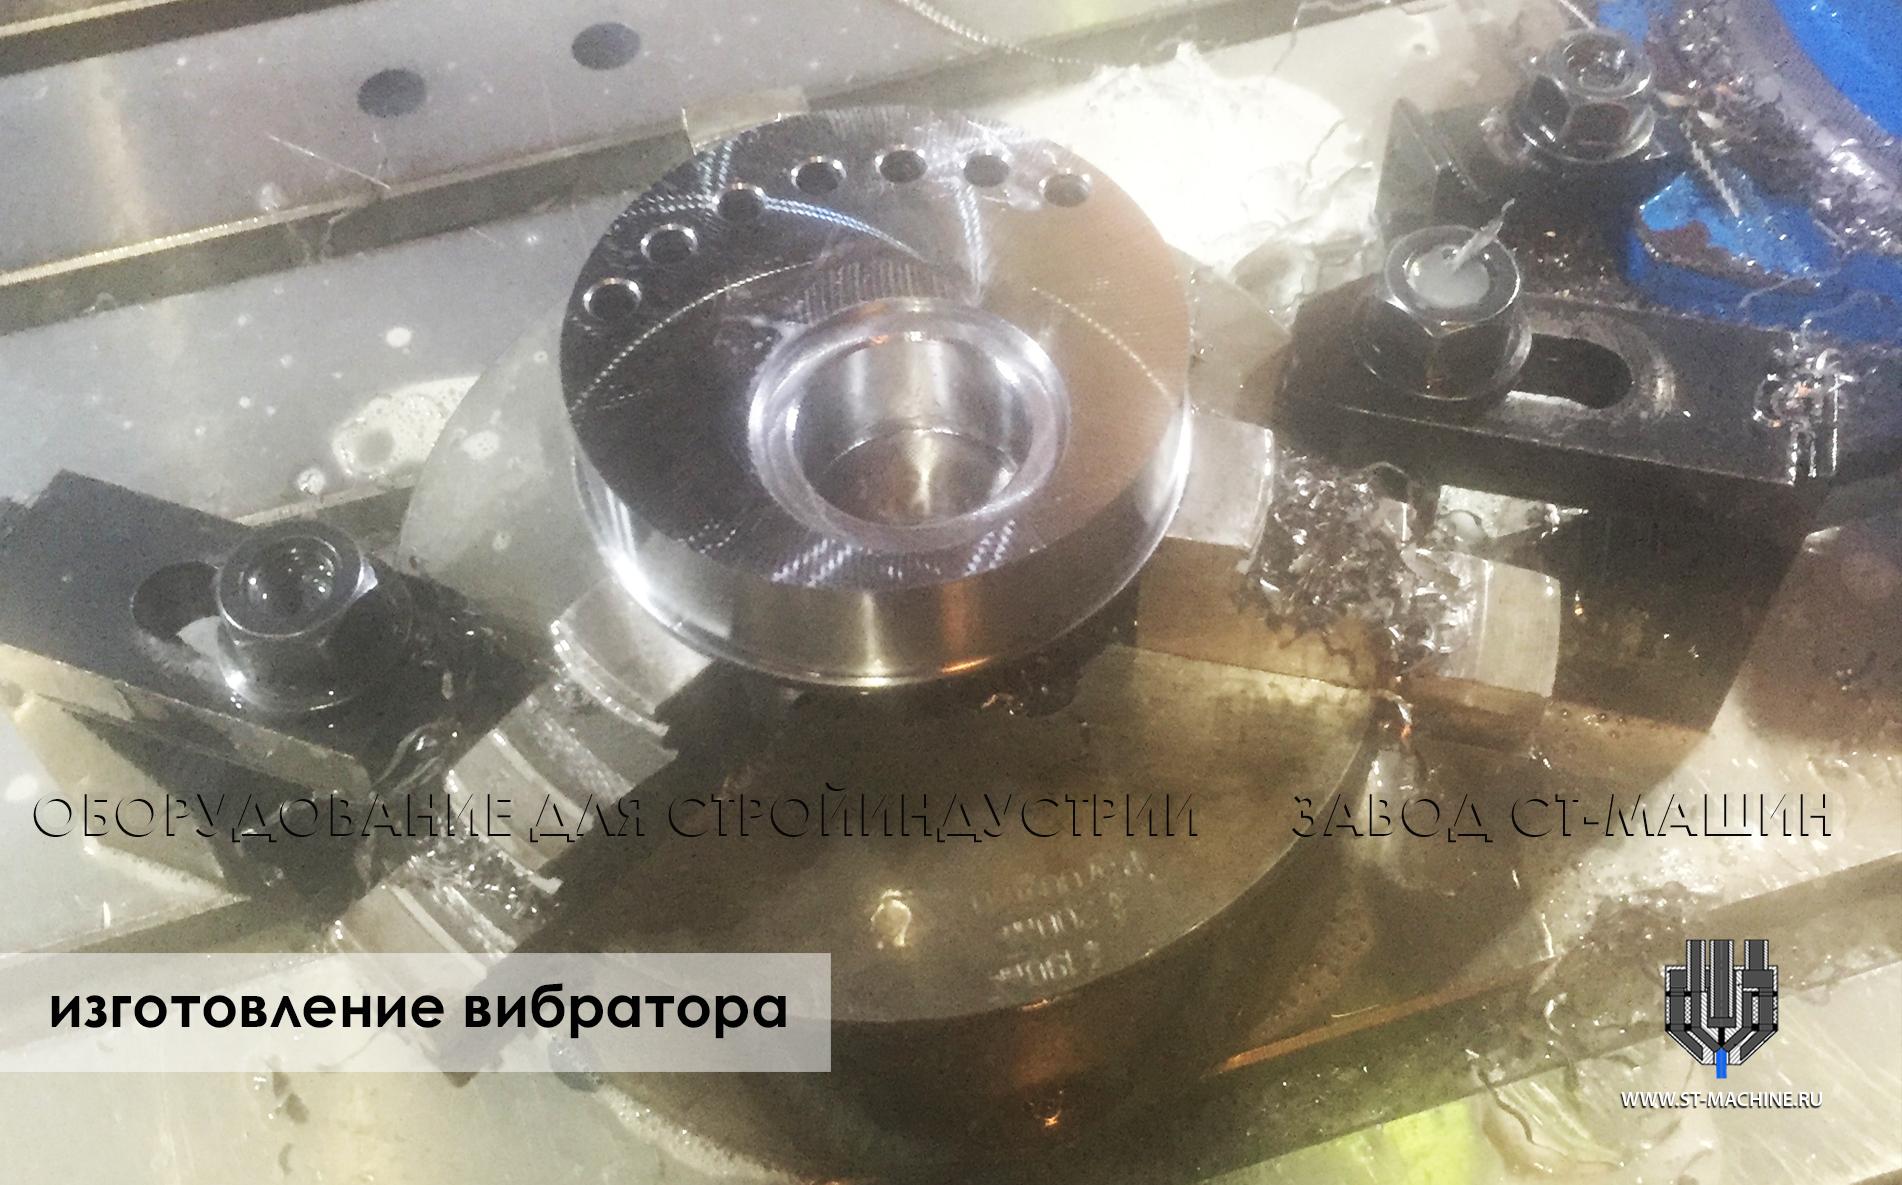 st-machine-ru-изготовление-вибратора.jpg